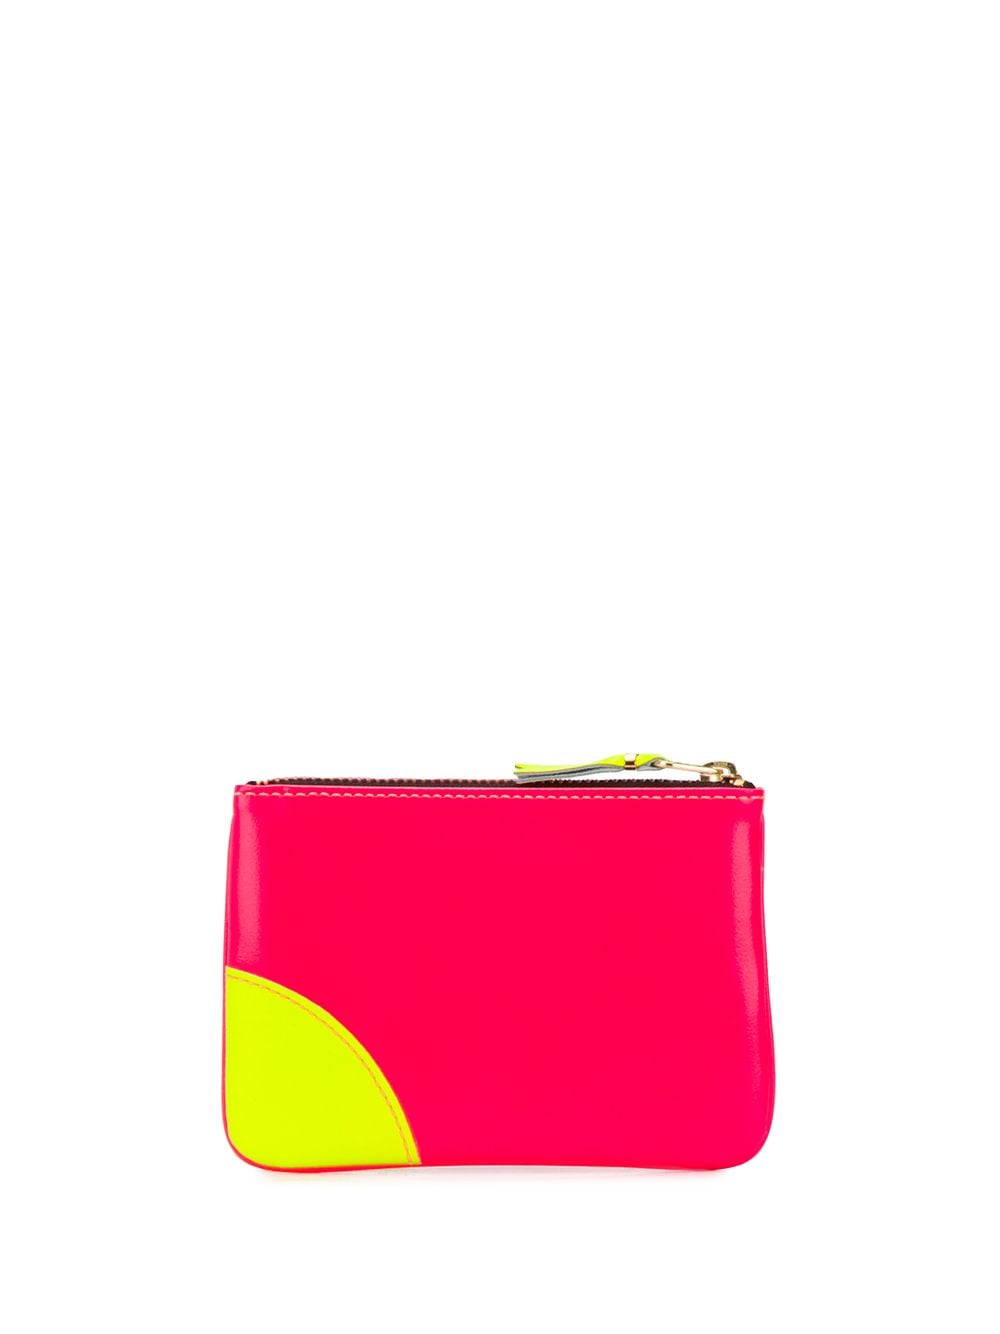 zip wallet unisex bicolor in leather COMME DES GARÇONS WALLET   Wallets   SA8100SFLO/P